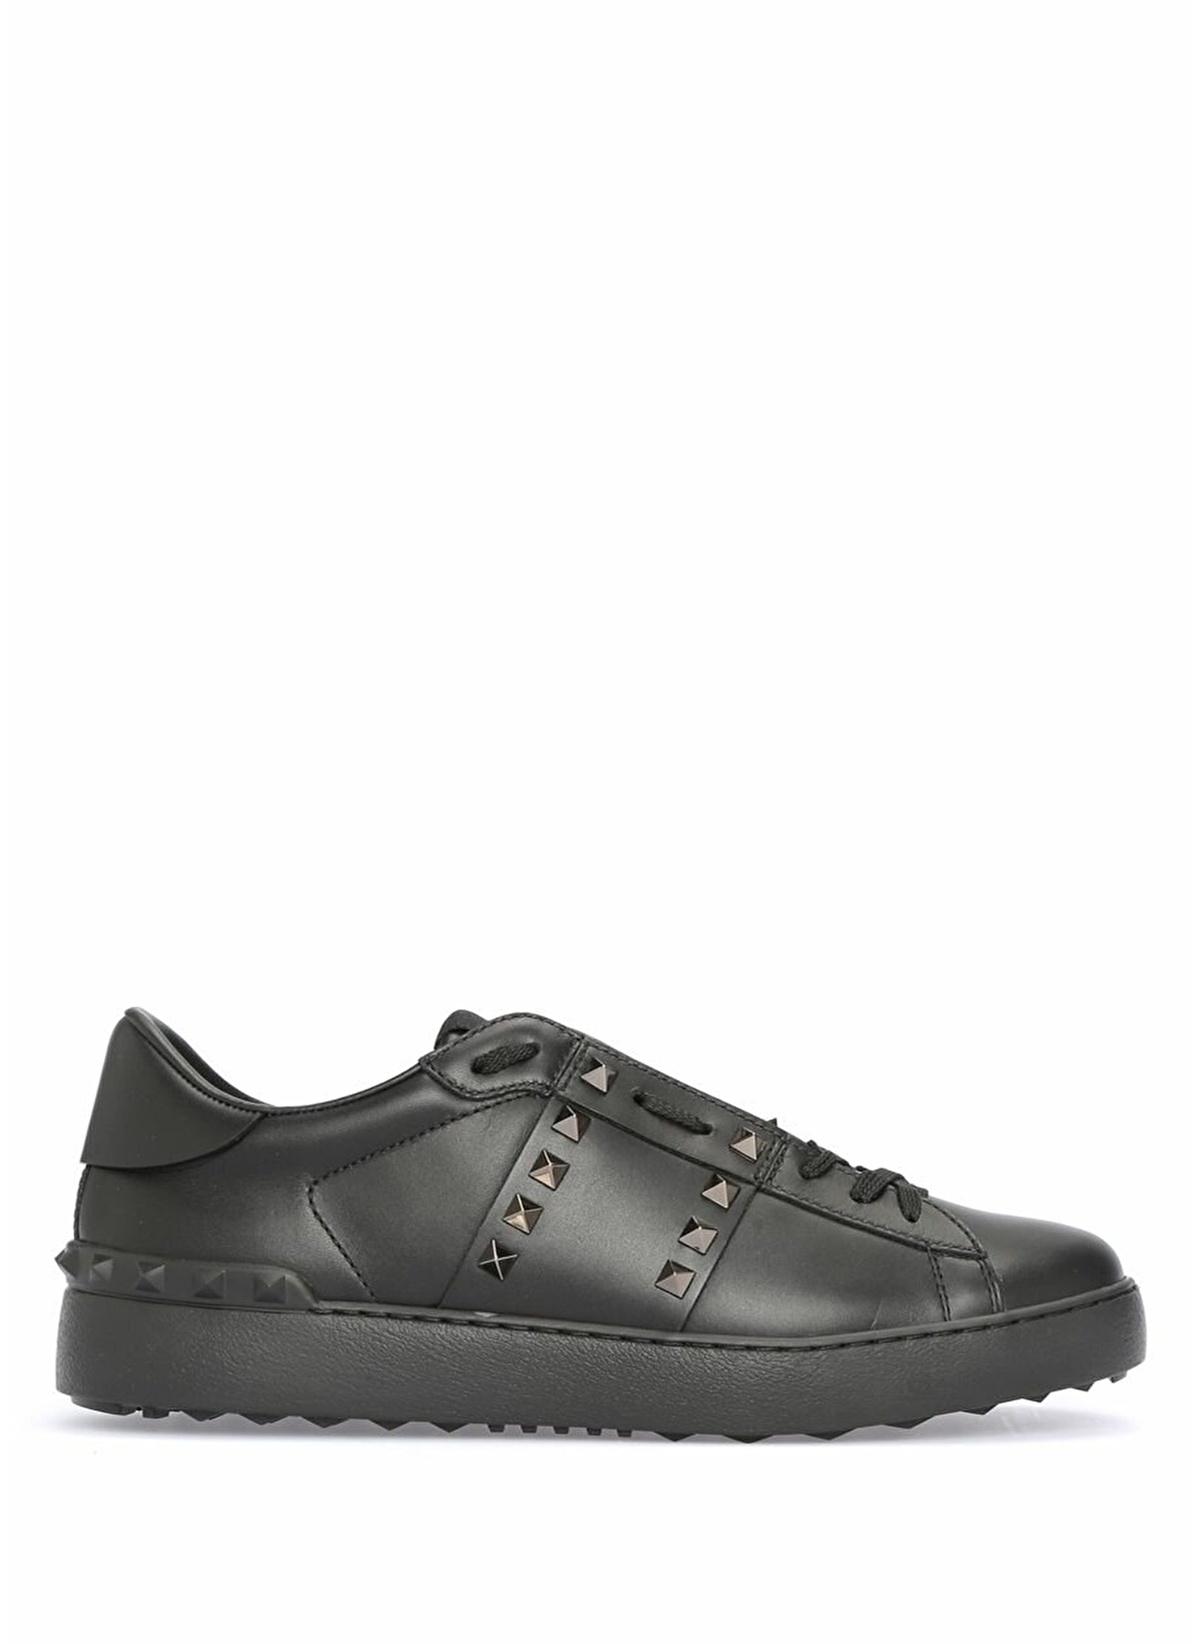 Valentino Lifestyle Ayakkabı 4695.0 Tl